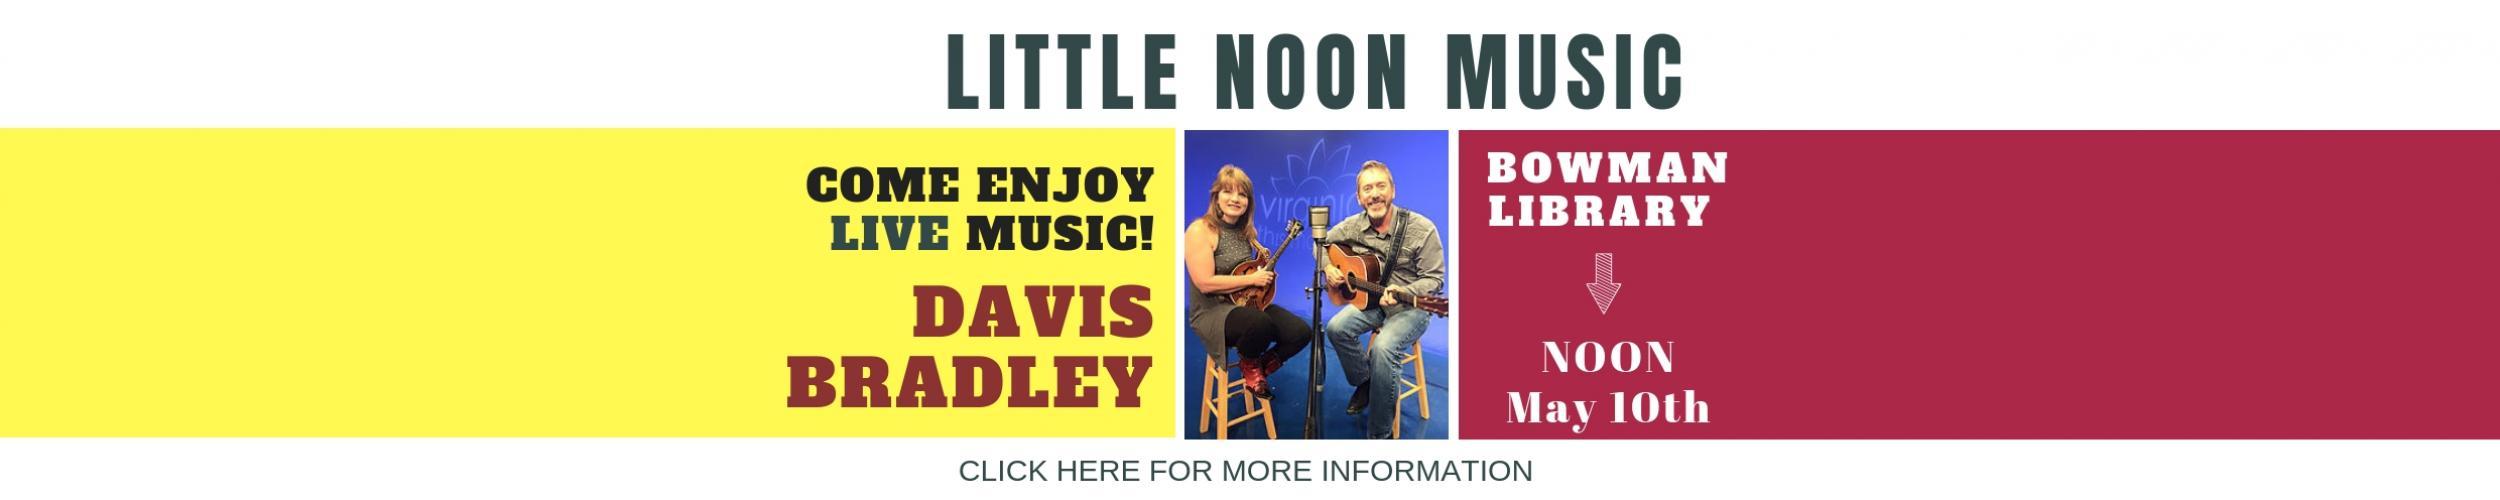 LITTLE NOON MUSIC DAVIS BRADLEY